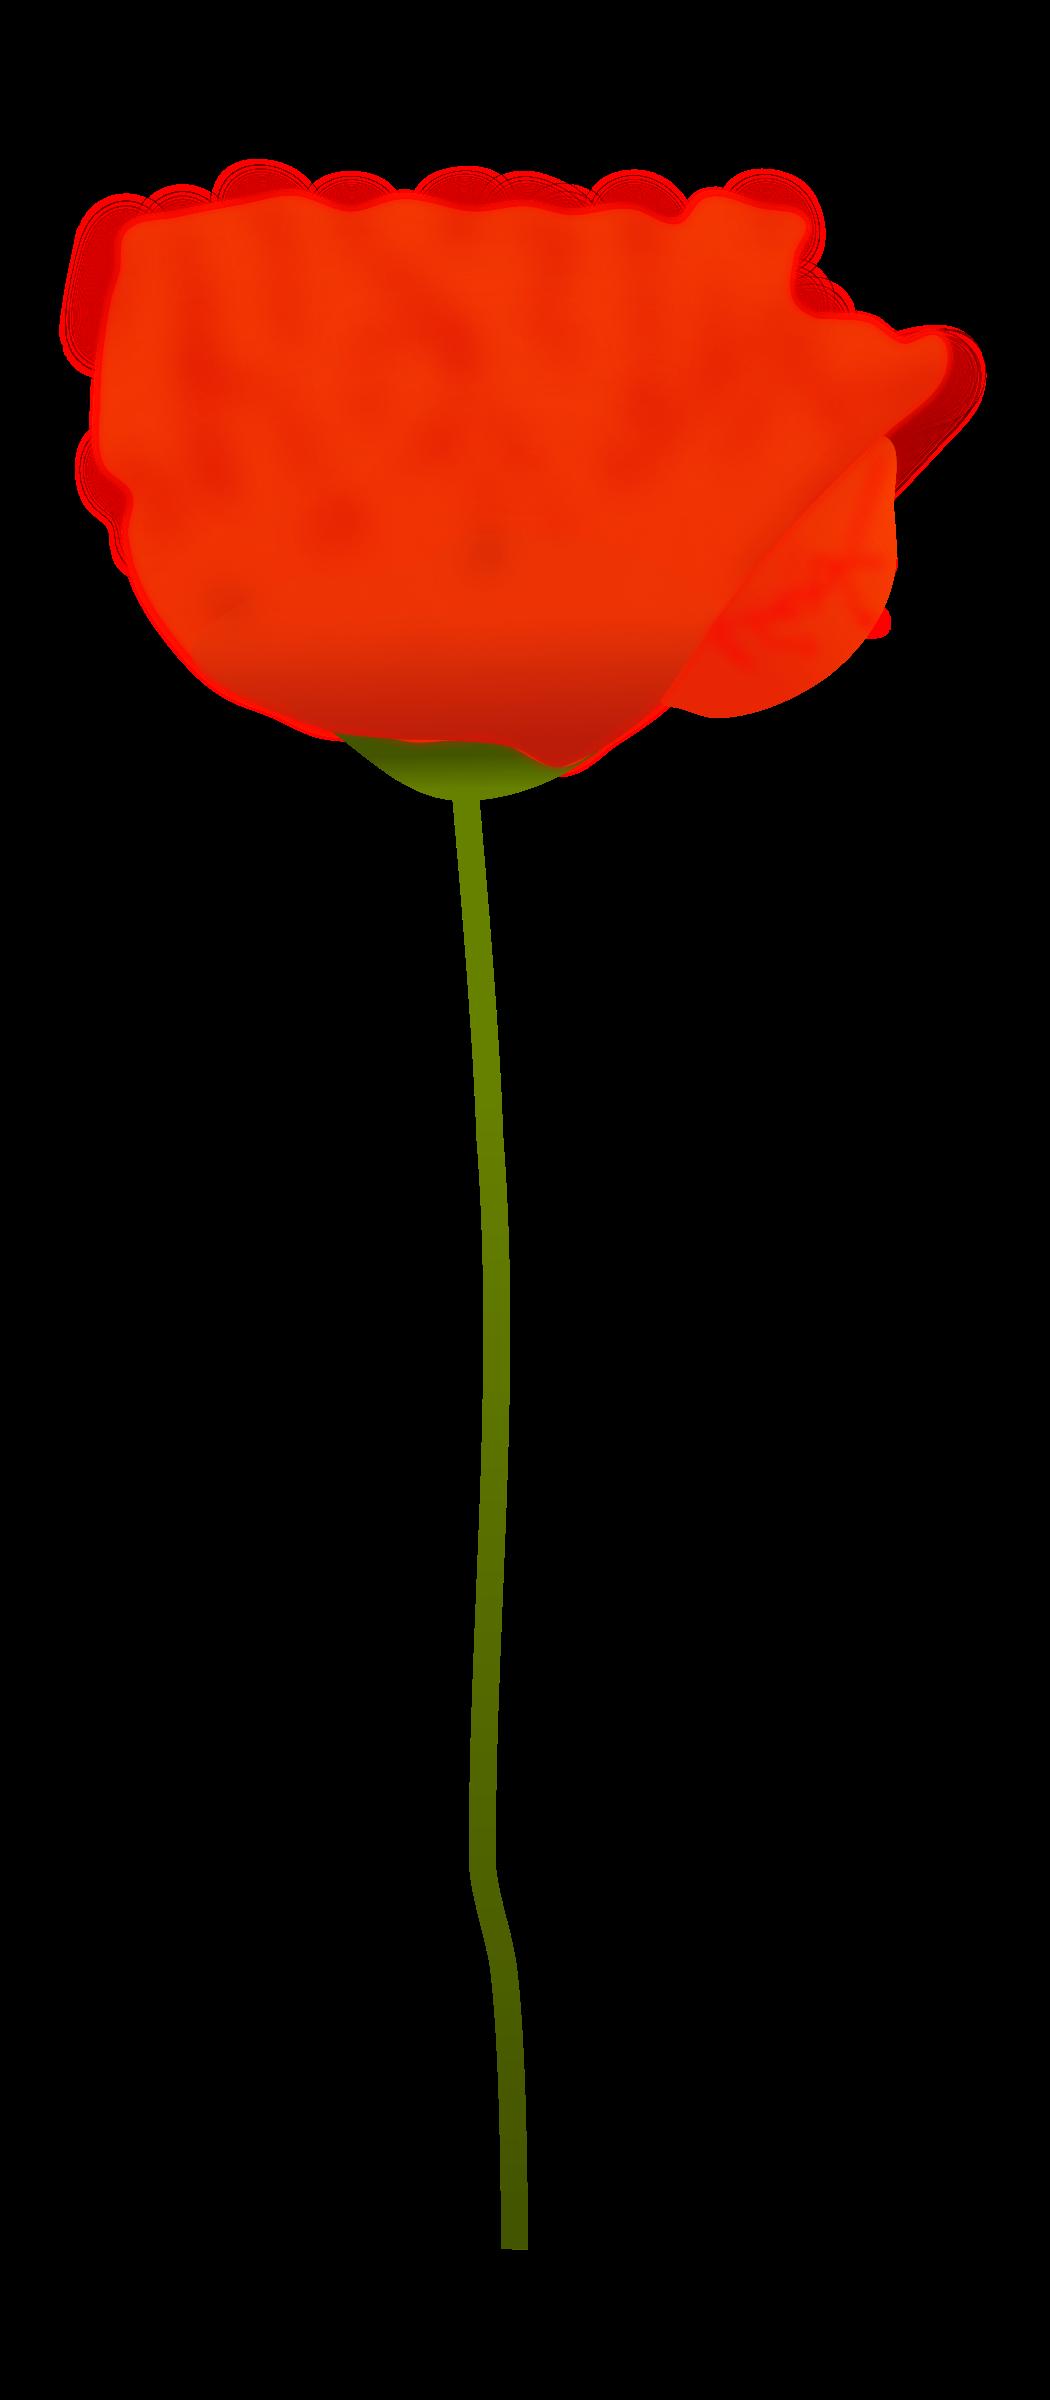 Plant free on dumielauxepices. Poppy clipart orange tulip